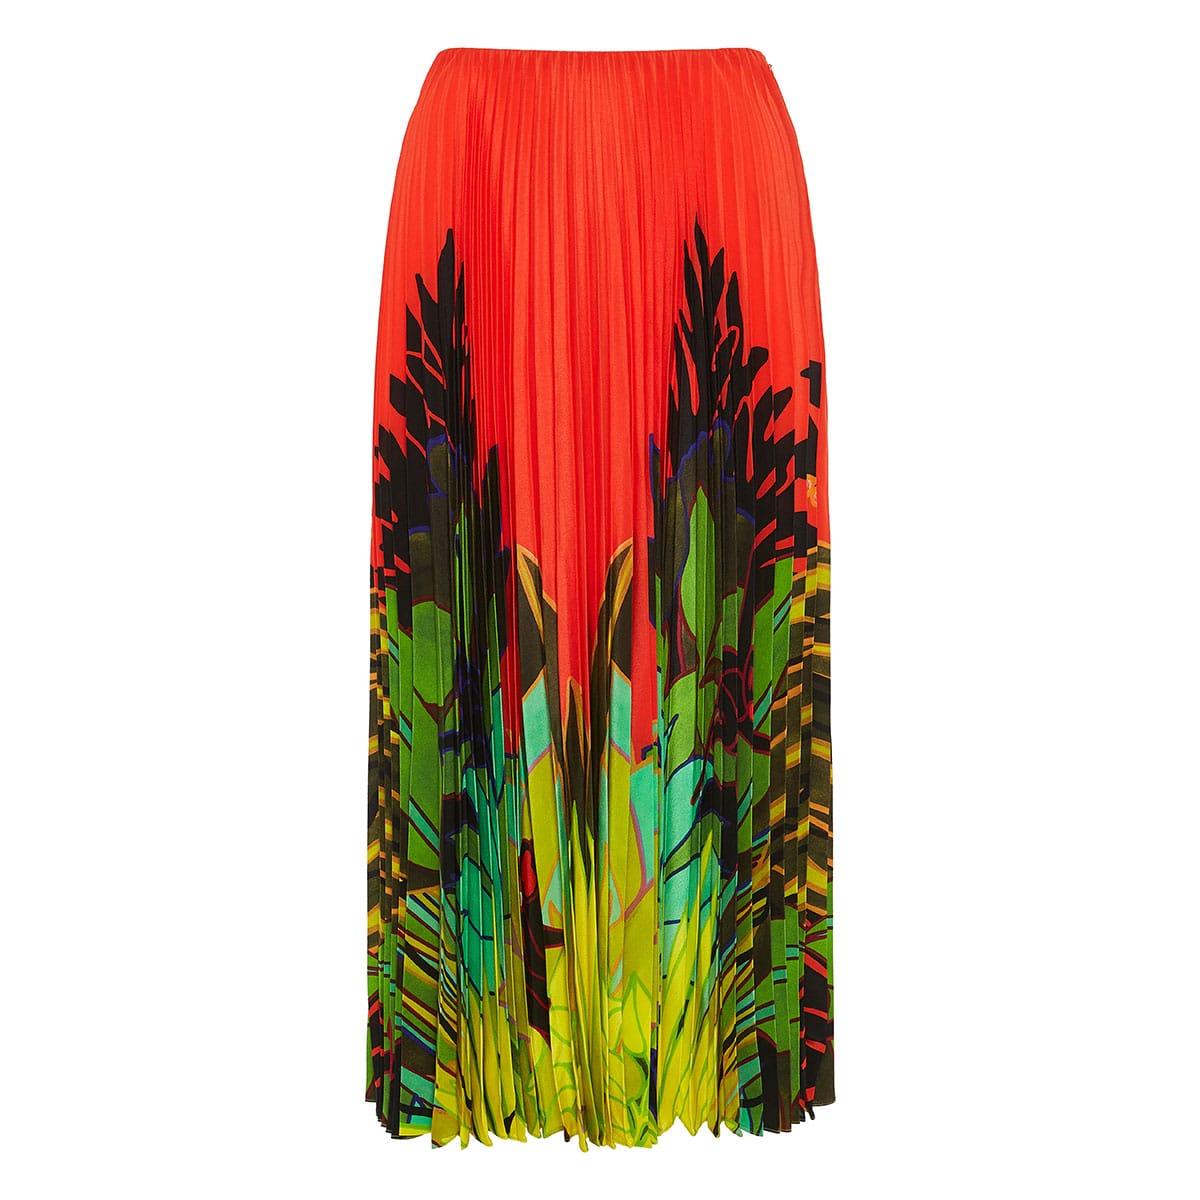 Mirrored Monkeys Forest pleated midi skirt